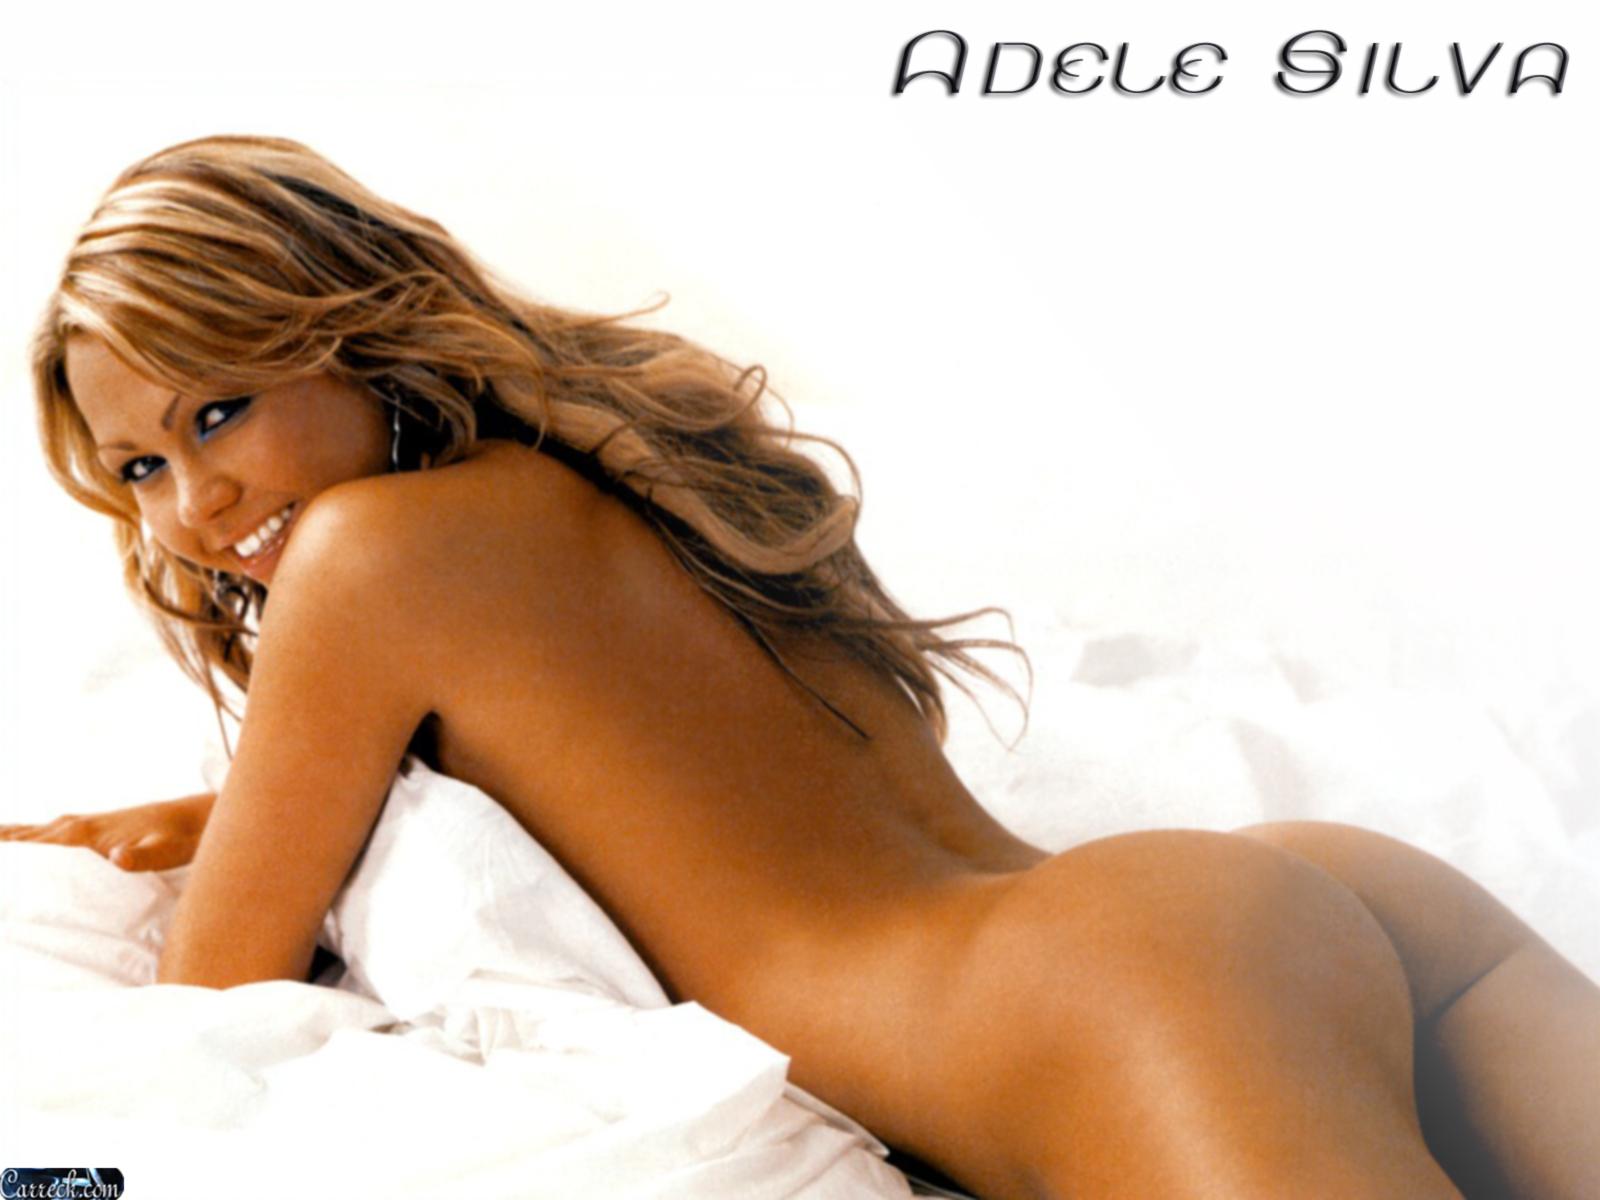 http://1.bp.blogspot.com/-LS3OdHowRs4/T3eAPQn4ufI/AAAAAAAAAug/P8MMppGKDXw/s1600/adele-silva003.jpg